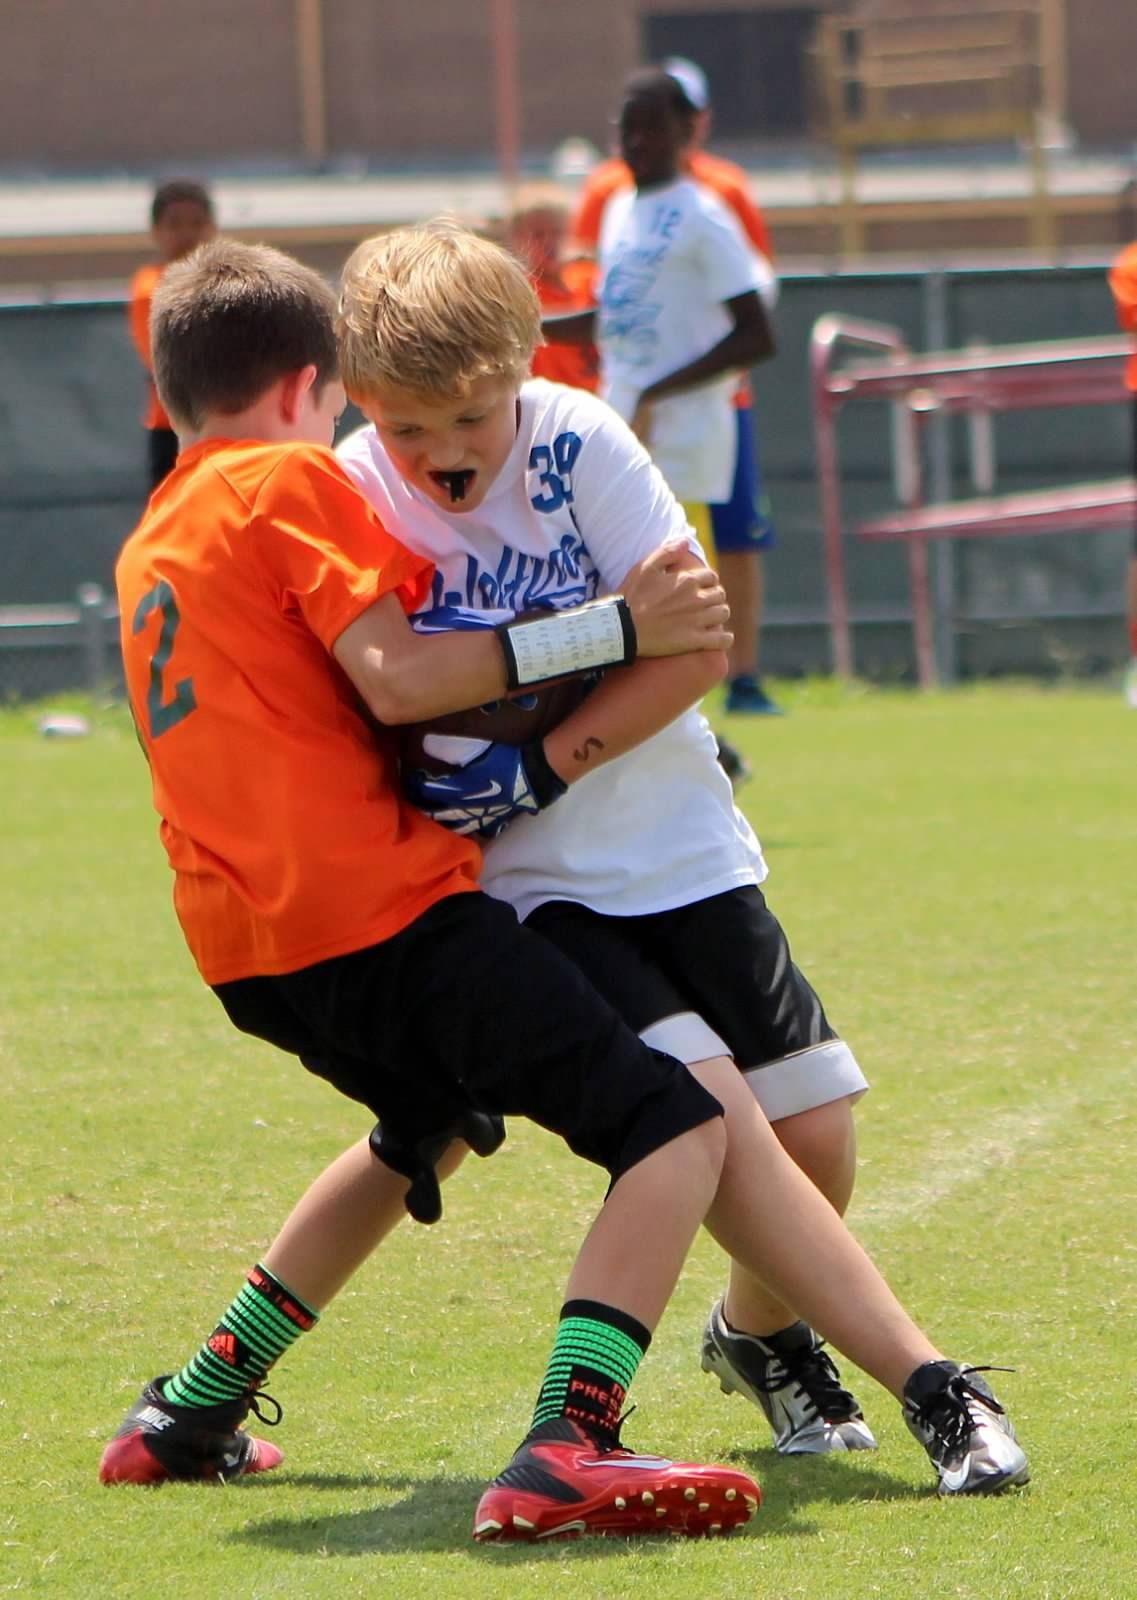 7 On 7 Football Season Update Youth Football Little League Football Football Coach